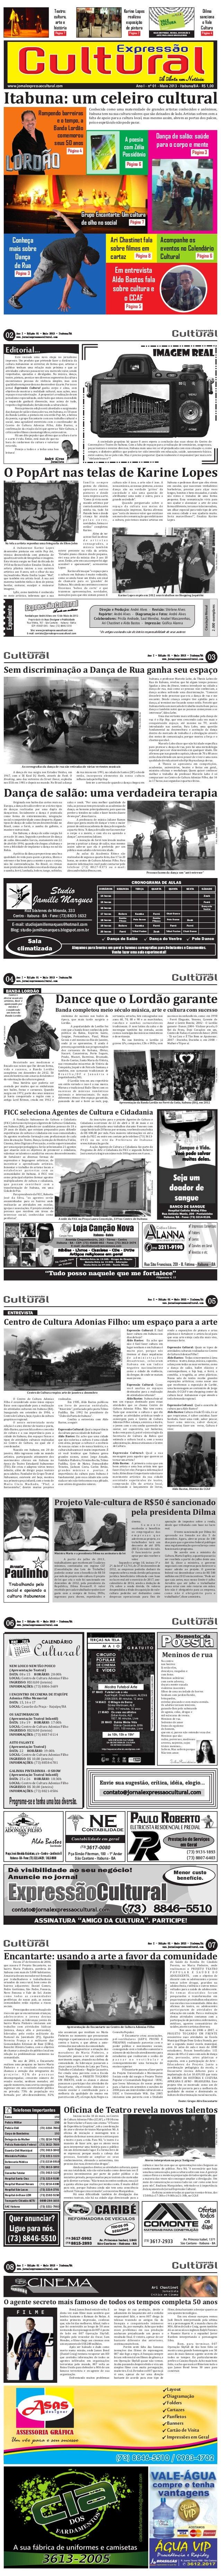 Teatro:cultura,arte ehistóriaPágina 7Karine Lopesrealizouexposiçãode pinturaPágina 2Dilmasancionao ValeCulturaPágina 4Itab...